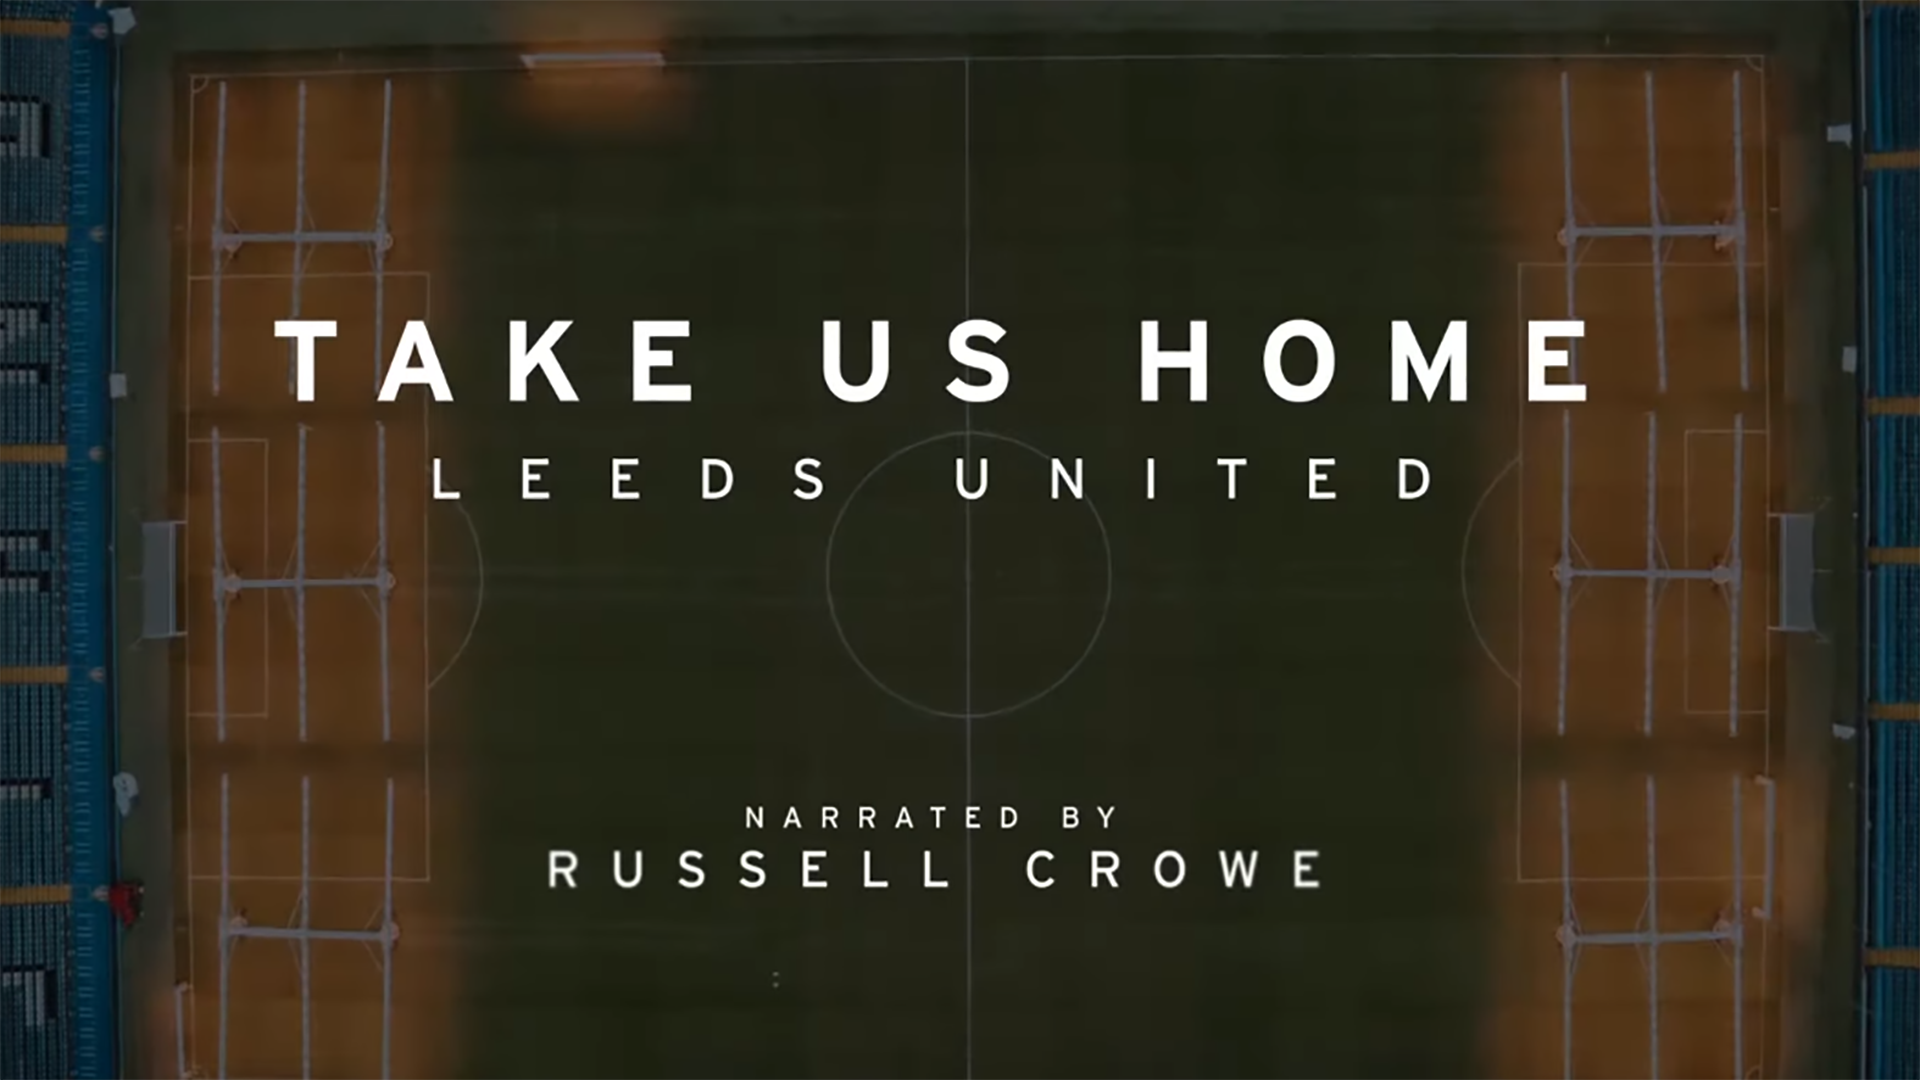 Take Us Home Leeds United documentary